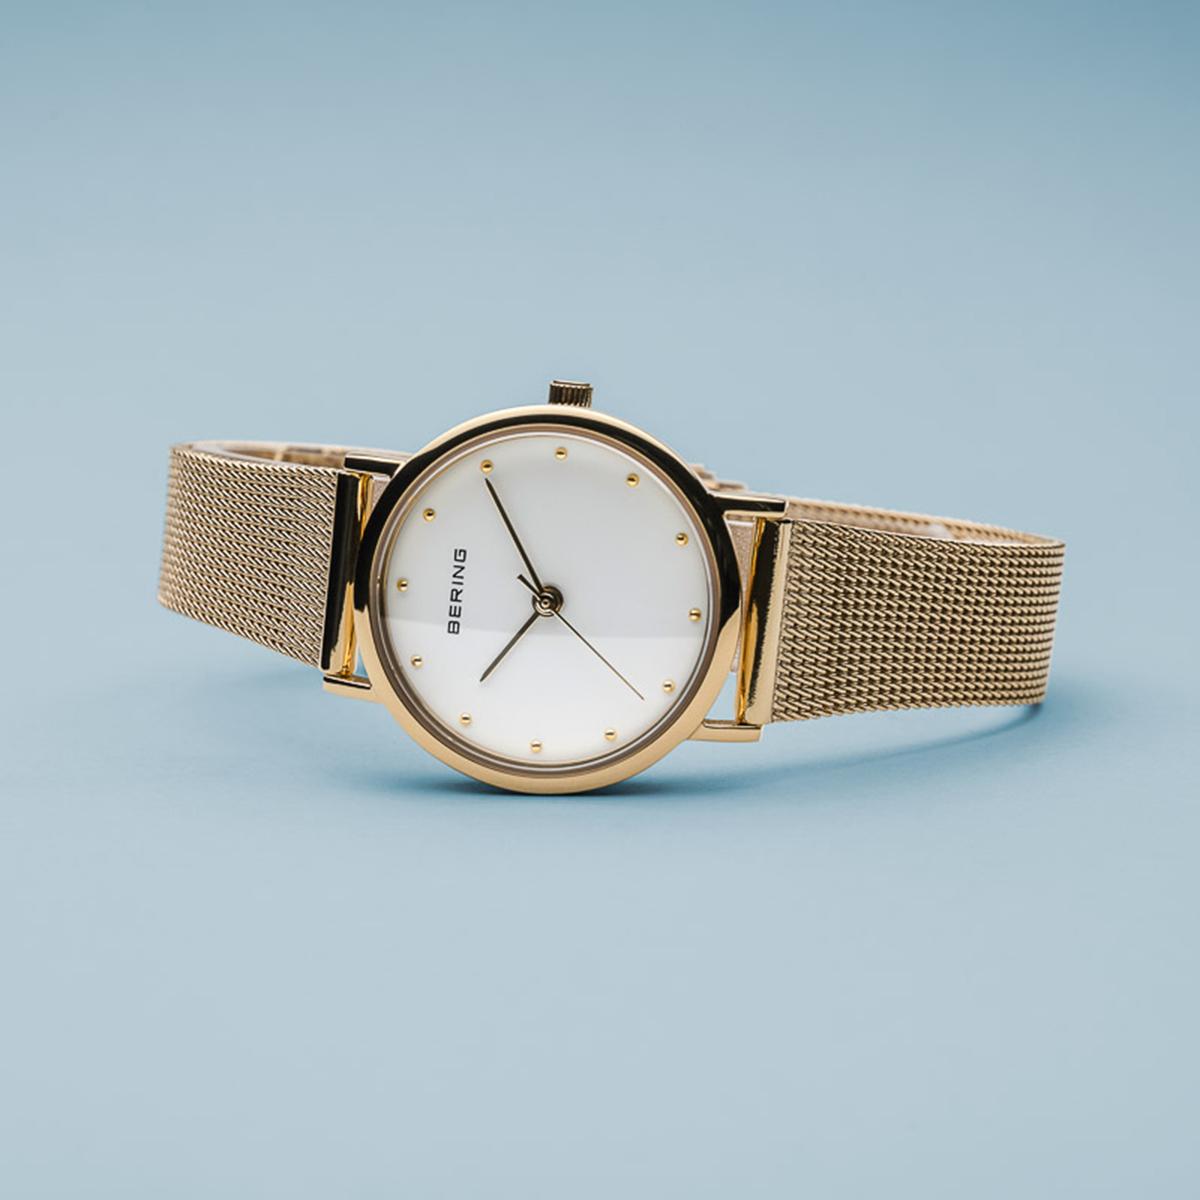 Zegarek damski Bering classic 13426-334 - duże 4